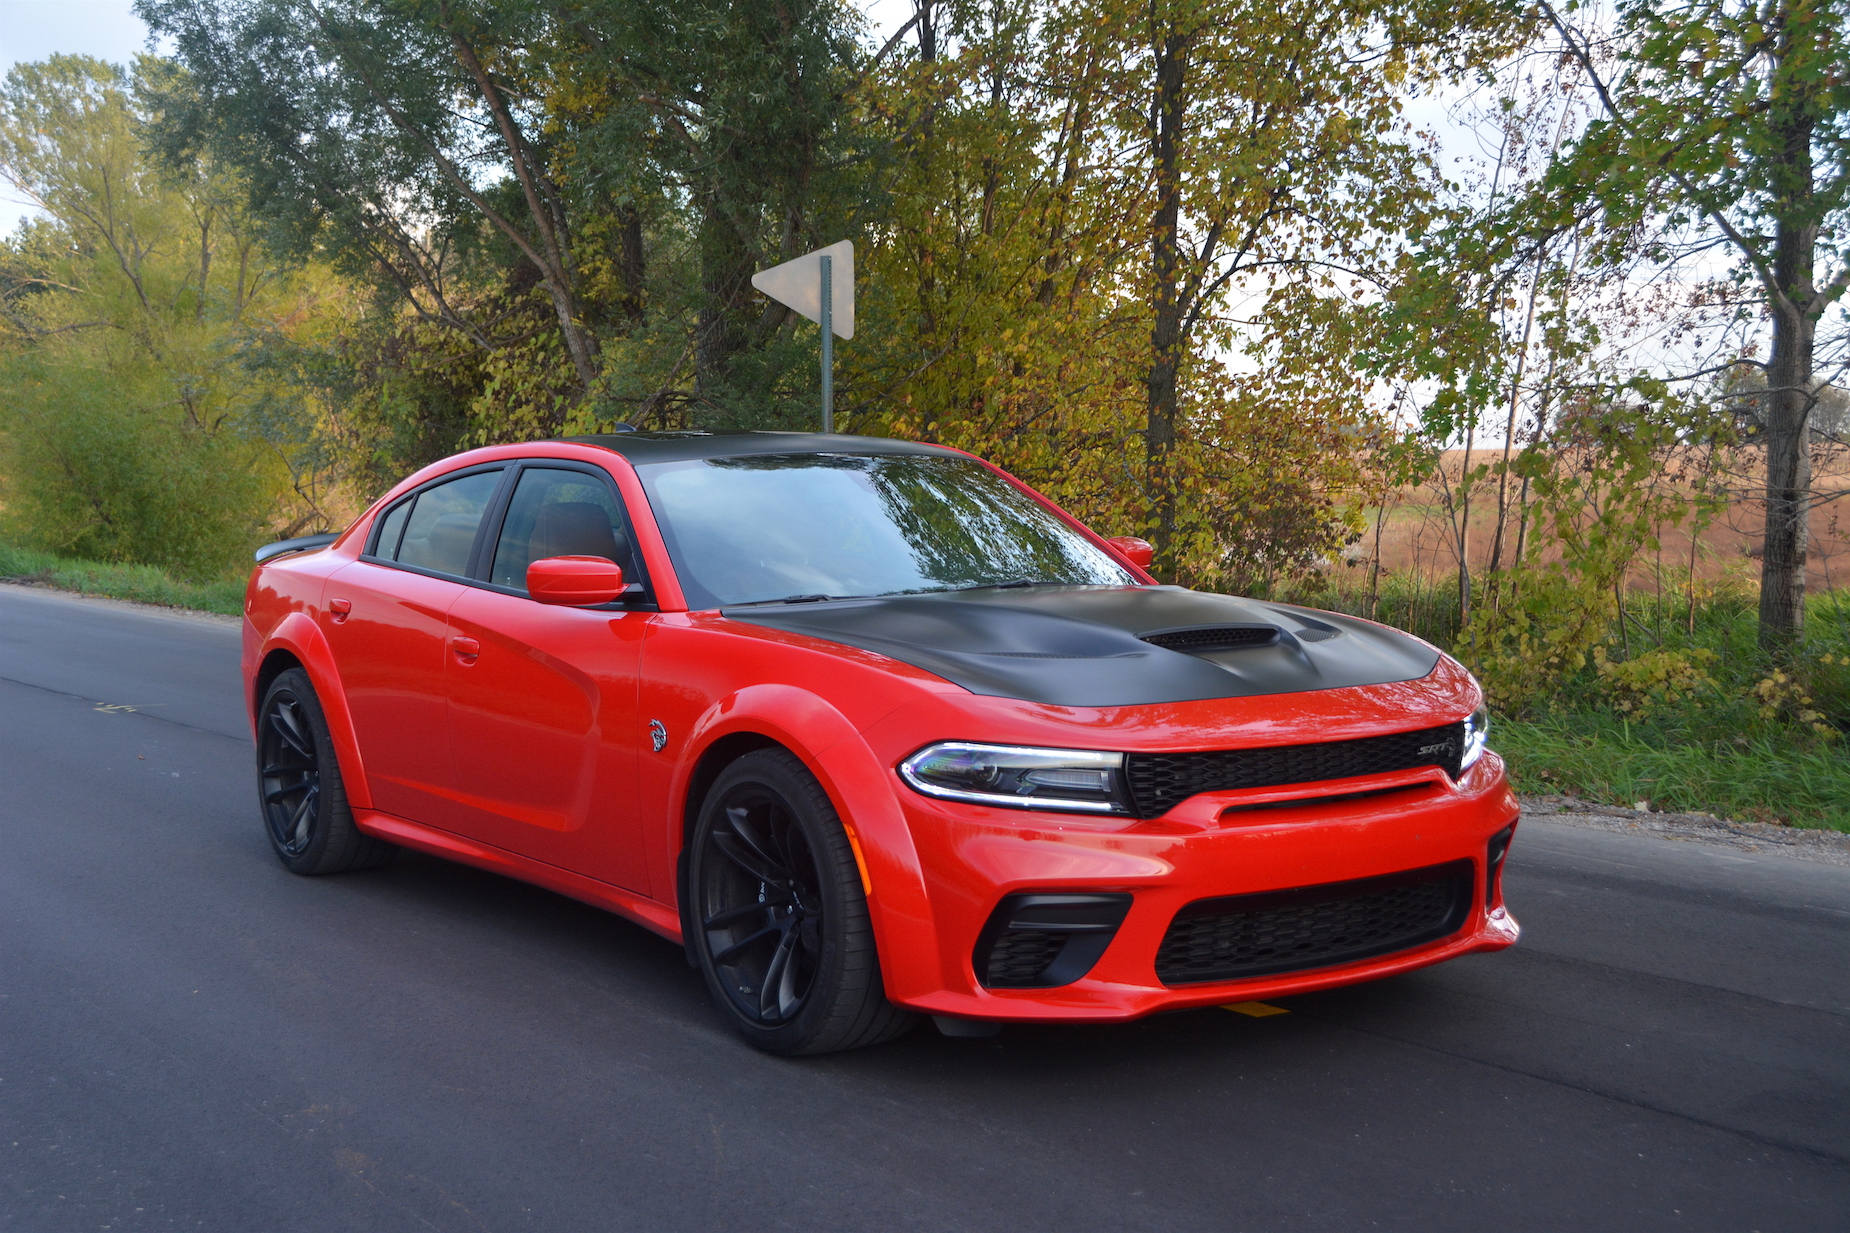 Dodge Charger SRT Hellcat Widebody Specs